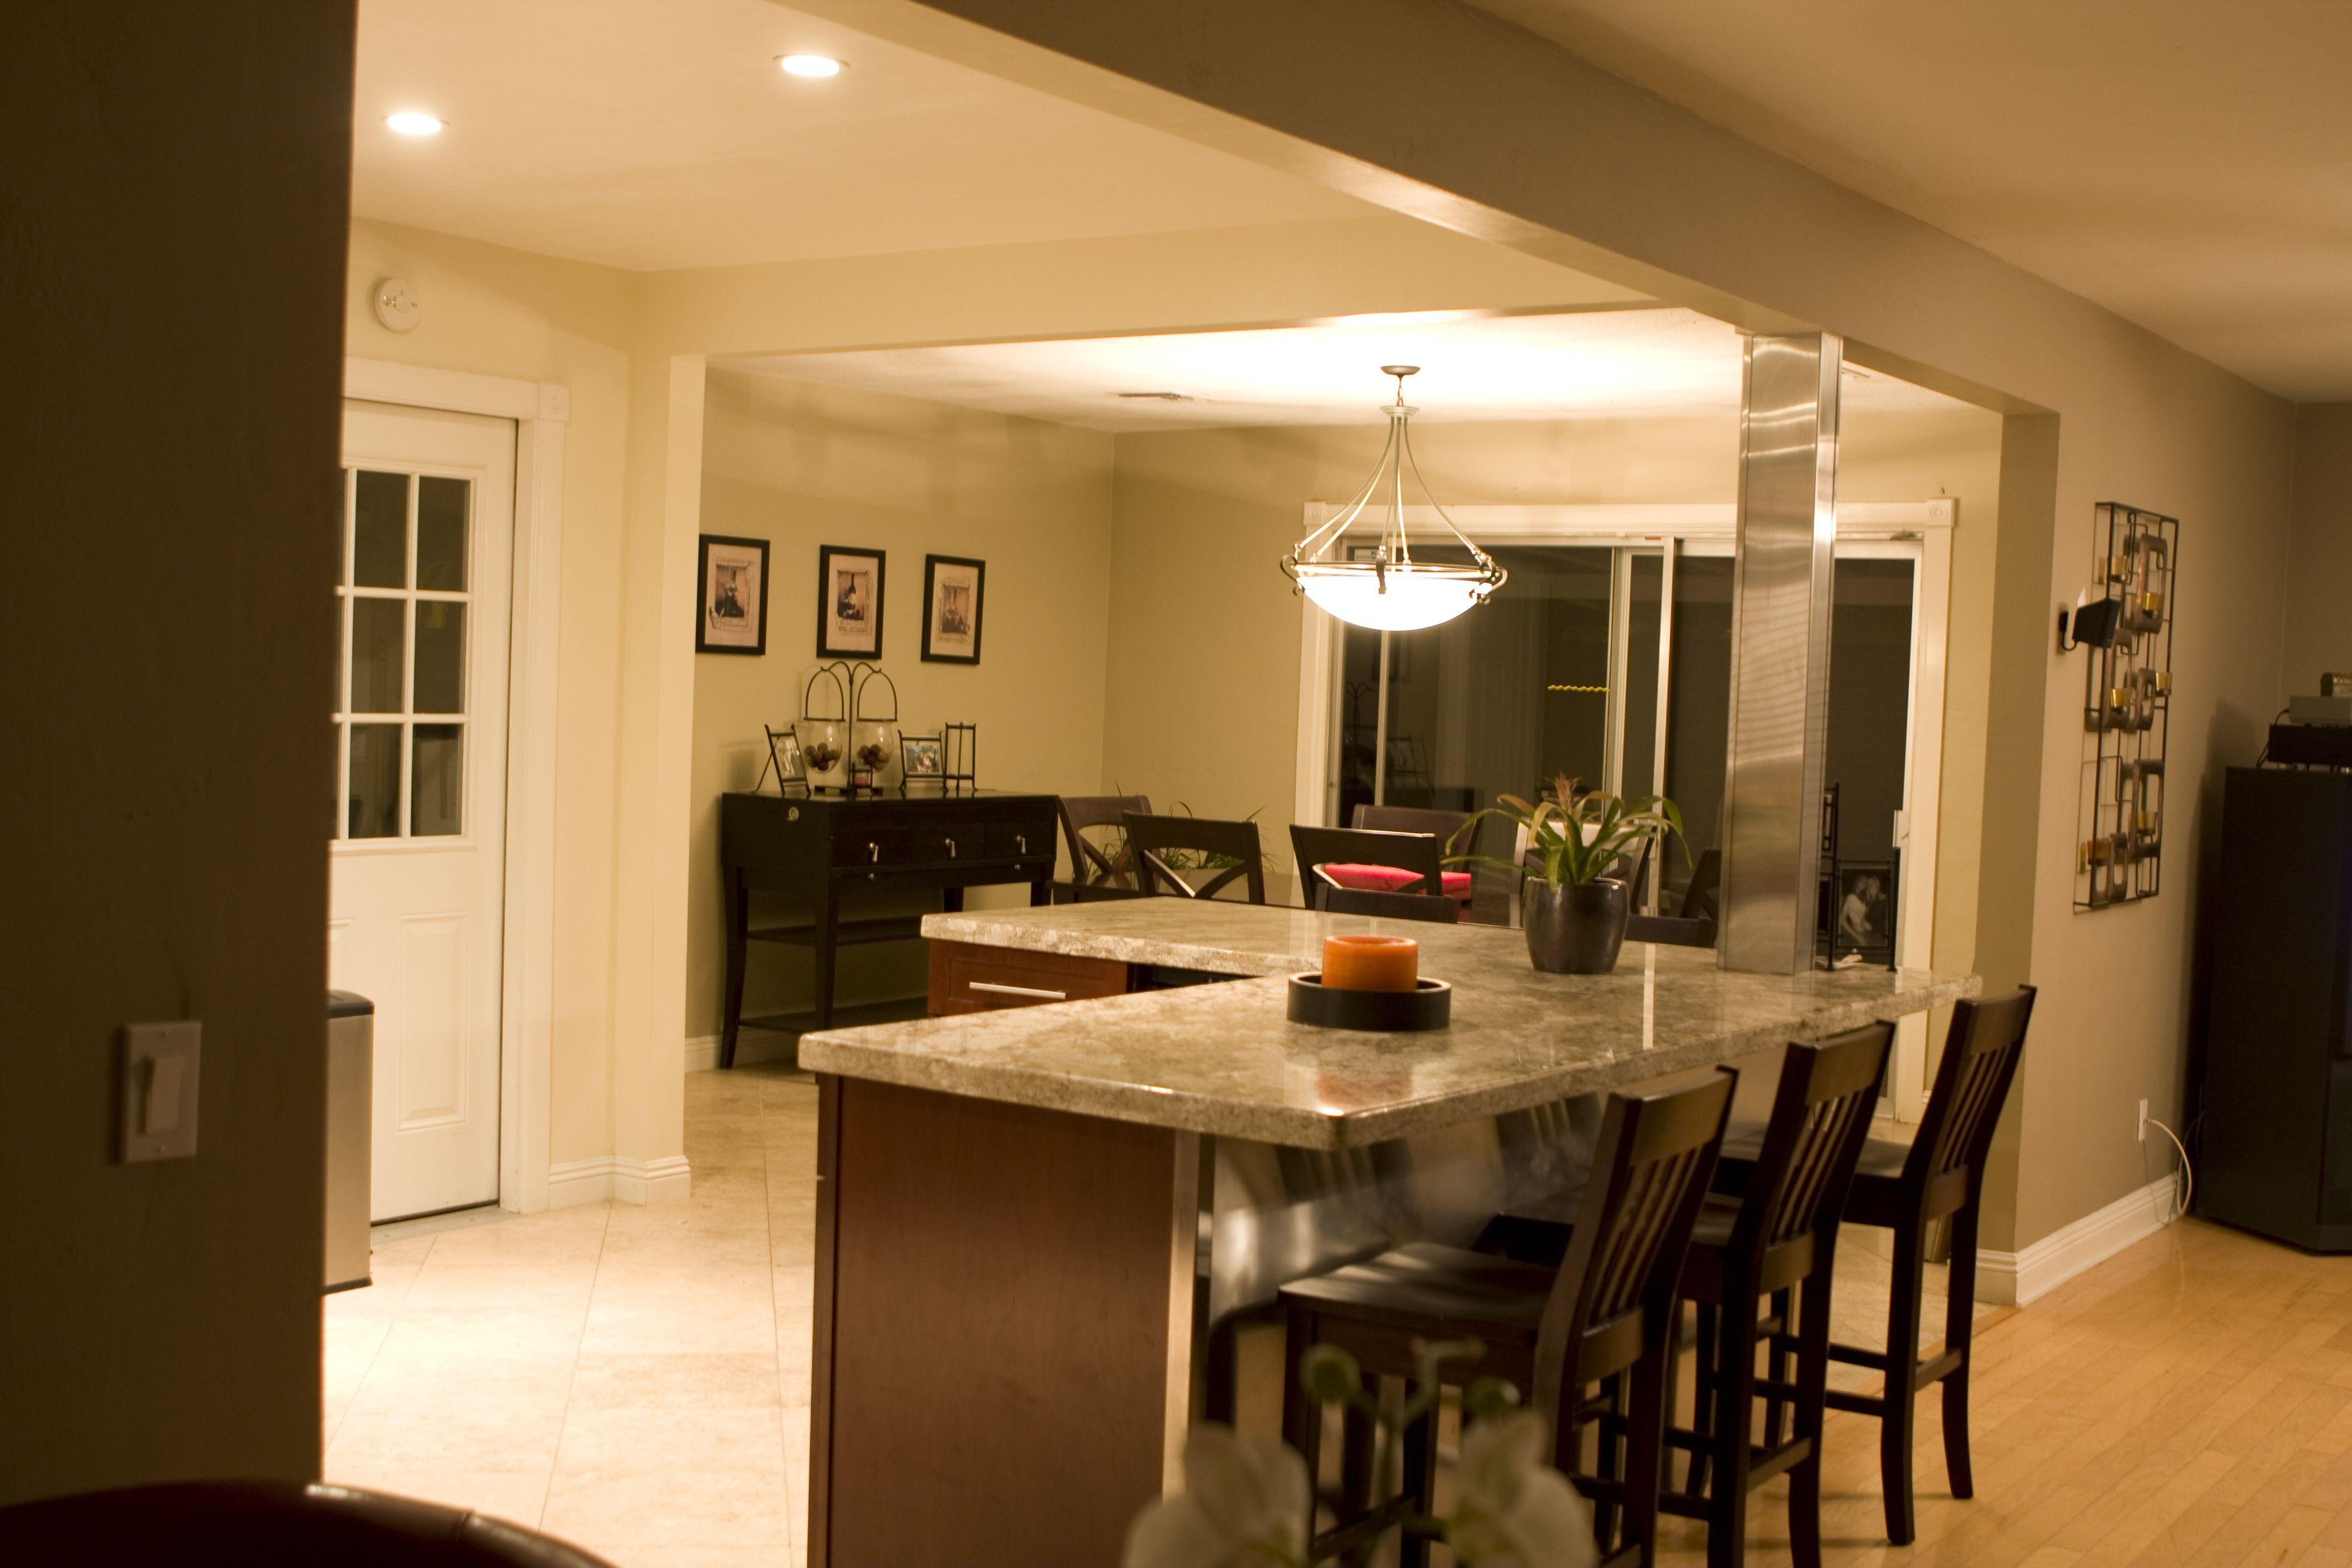 34th place remodel kitchen design decor kitchen remodel design living room decor apartment on kitchen remodel ranch id=17006